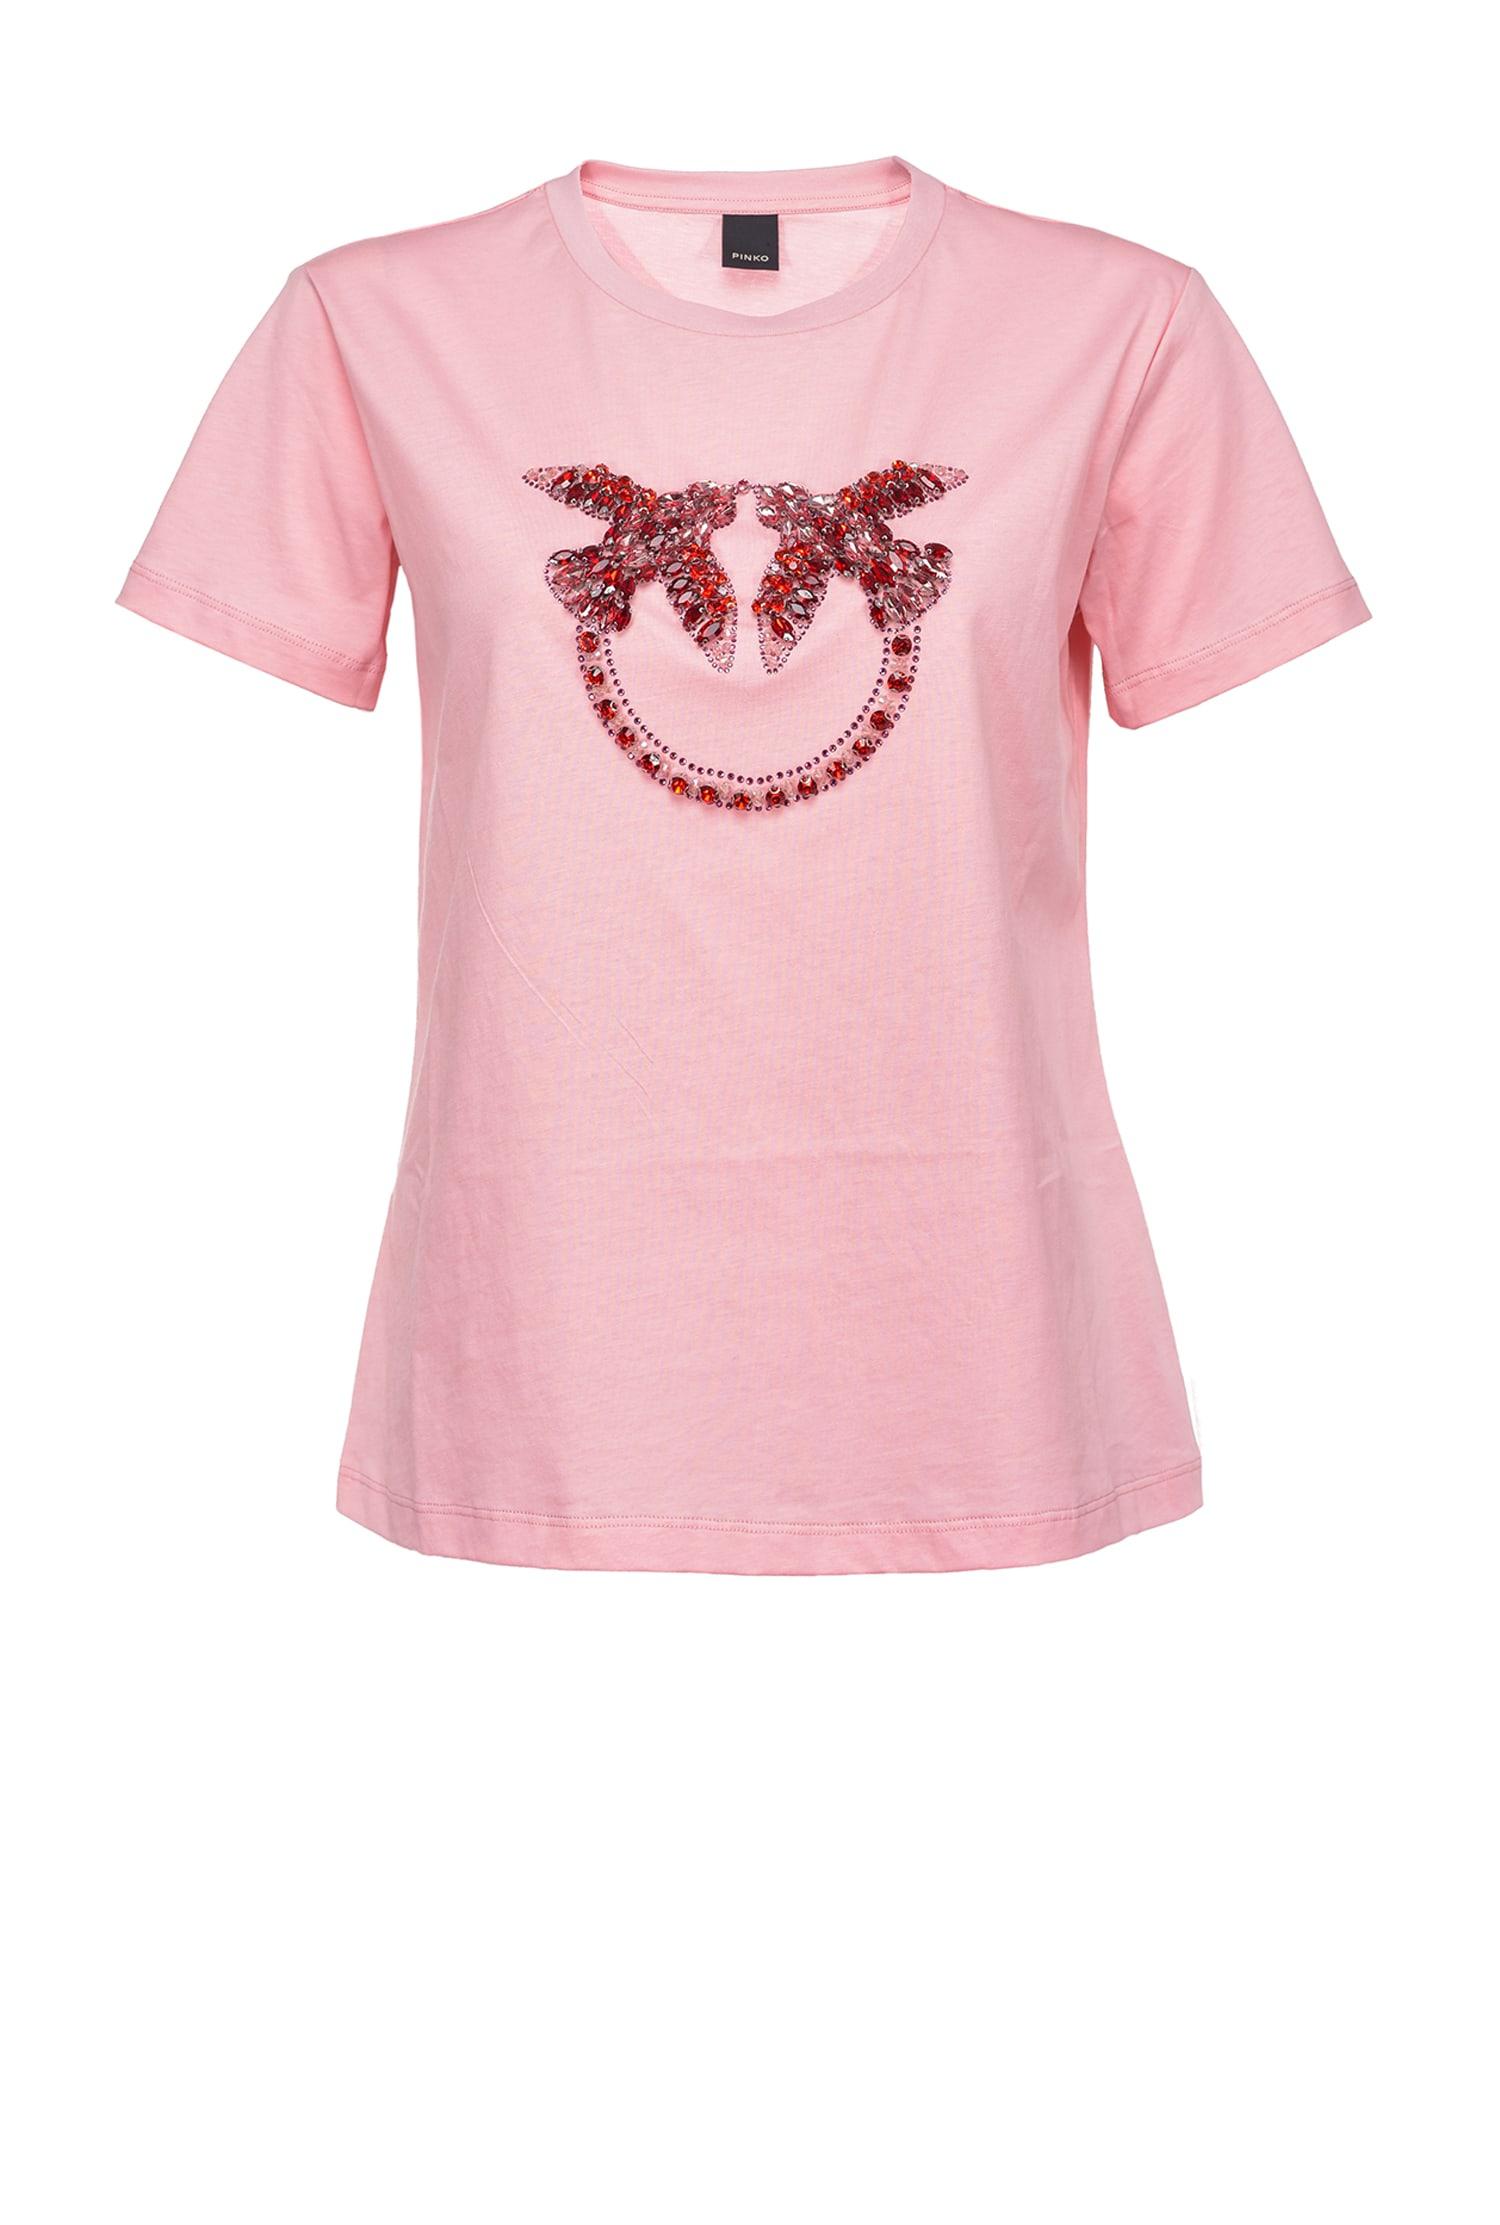 T-shirt Quentin 1 ricamo rosa Pinko